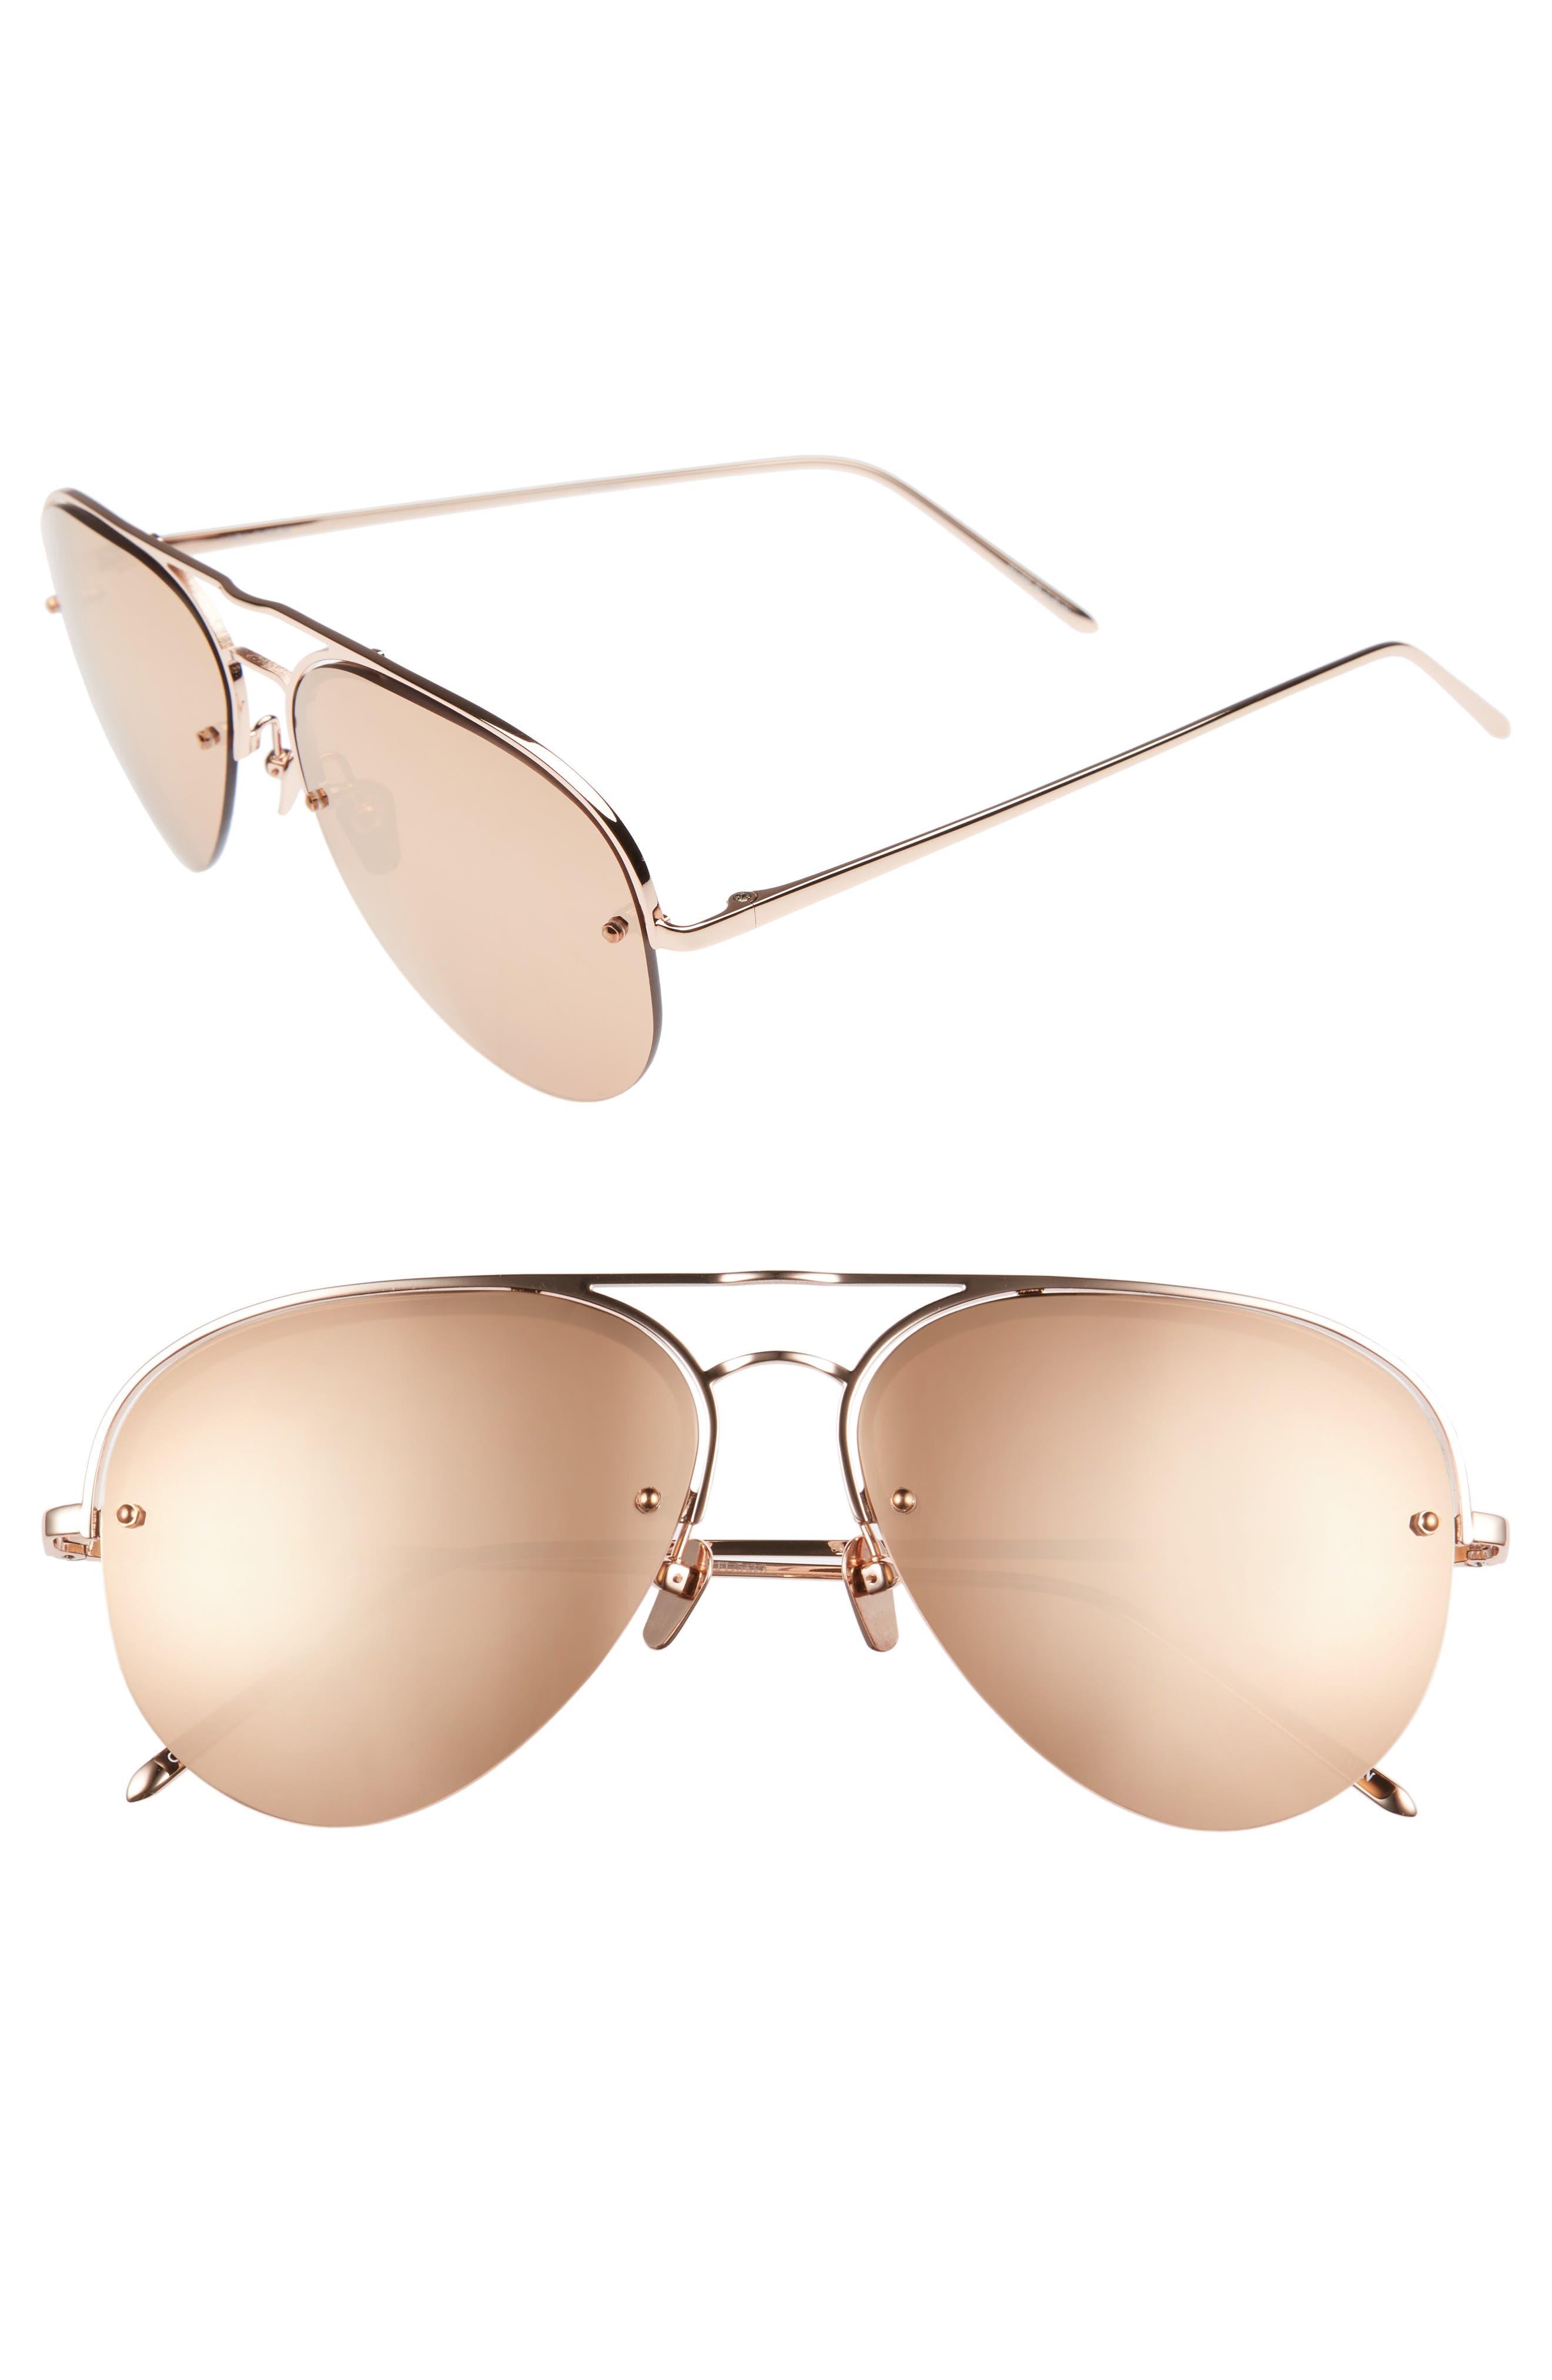 Main Image - Linda Farrow 60mm Mirrored 18 Karat Gold Aviator Sunglasses